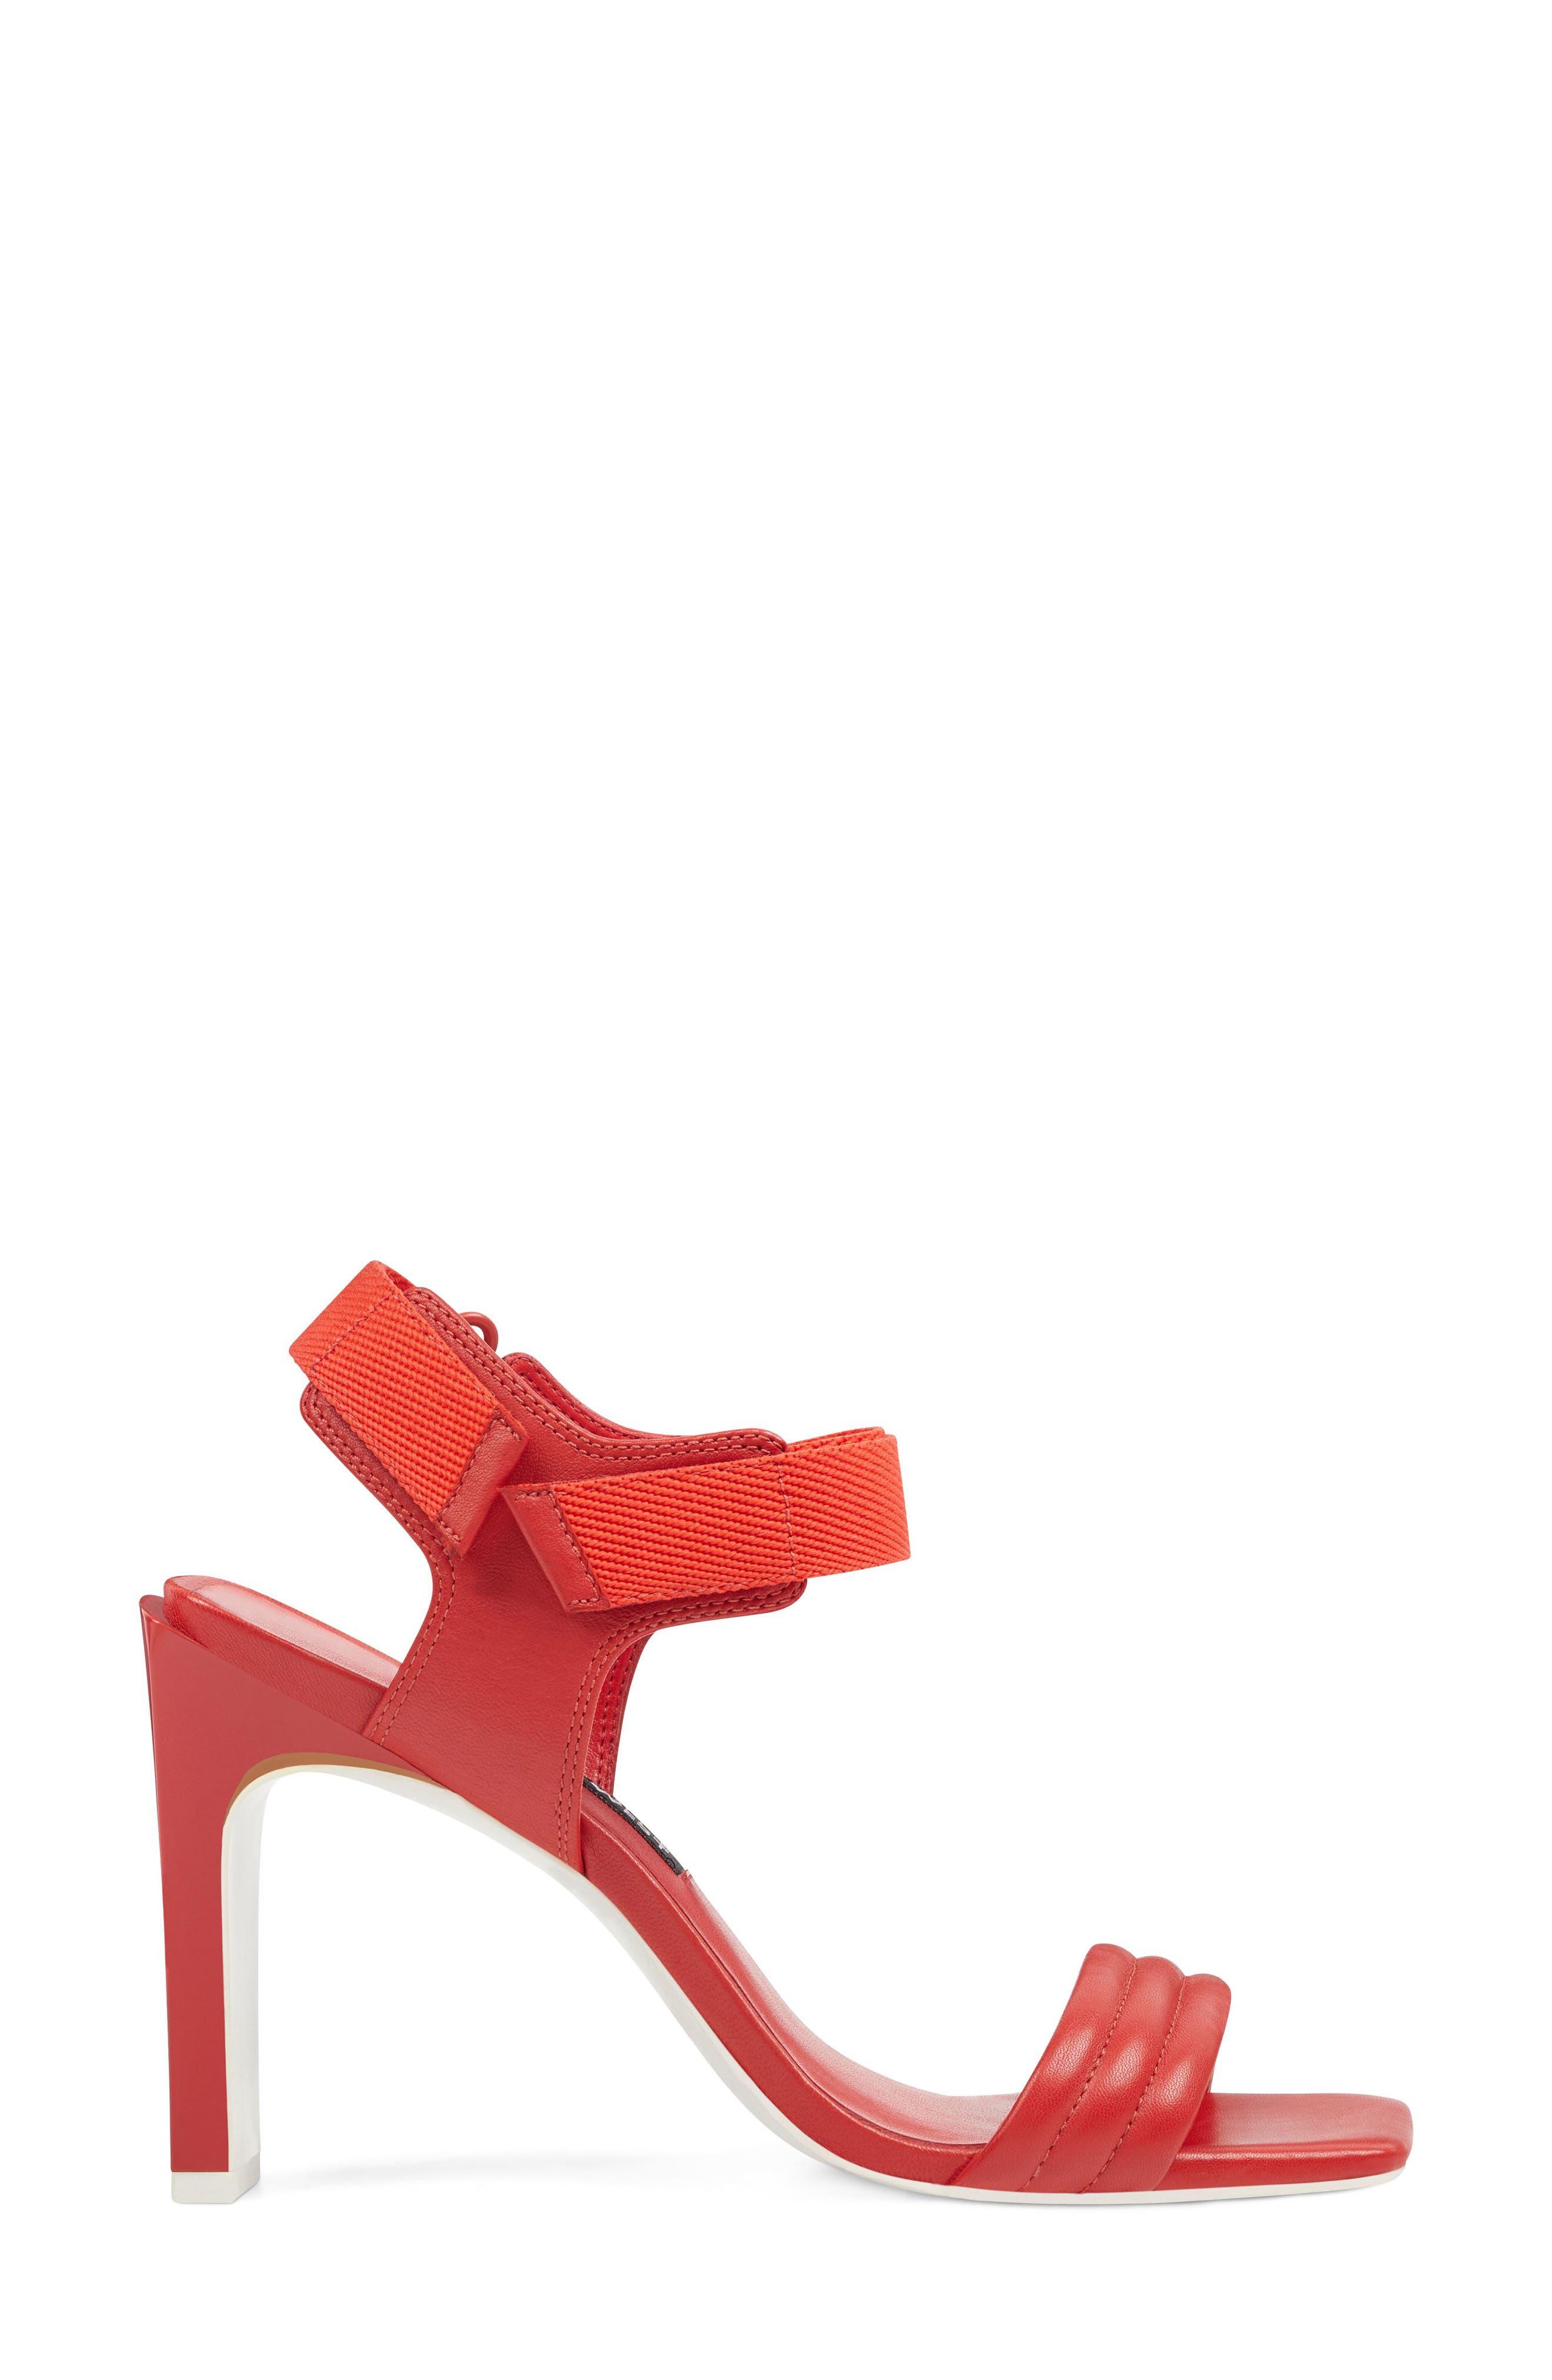 Zebree Sandal,                             Alternate thumbnail 2, color,                             Red Leather